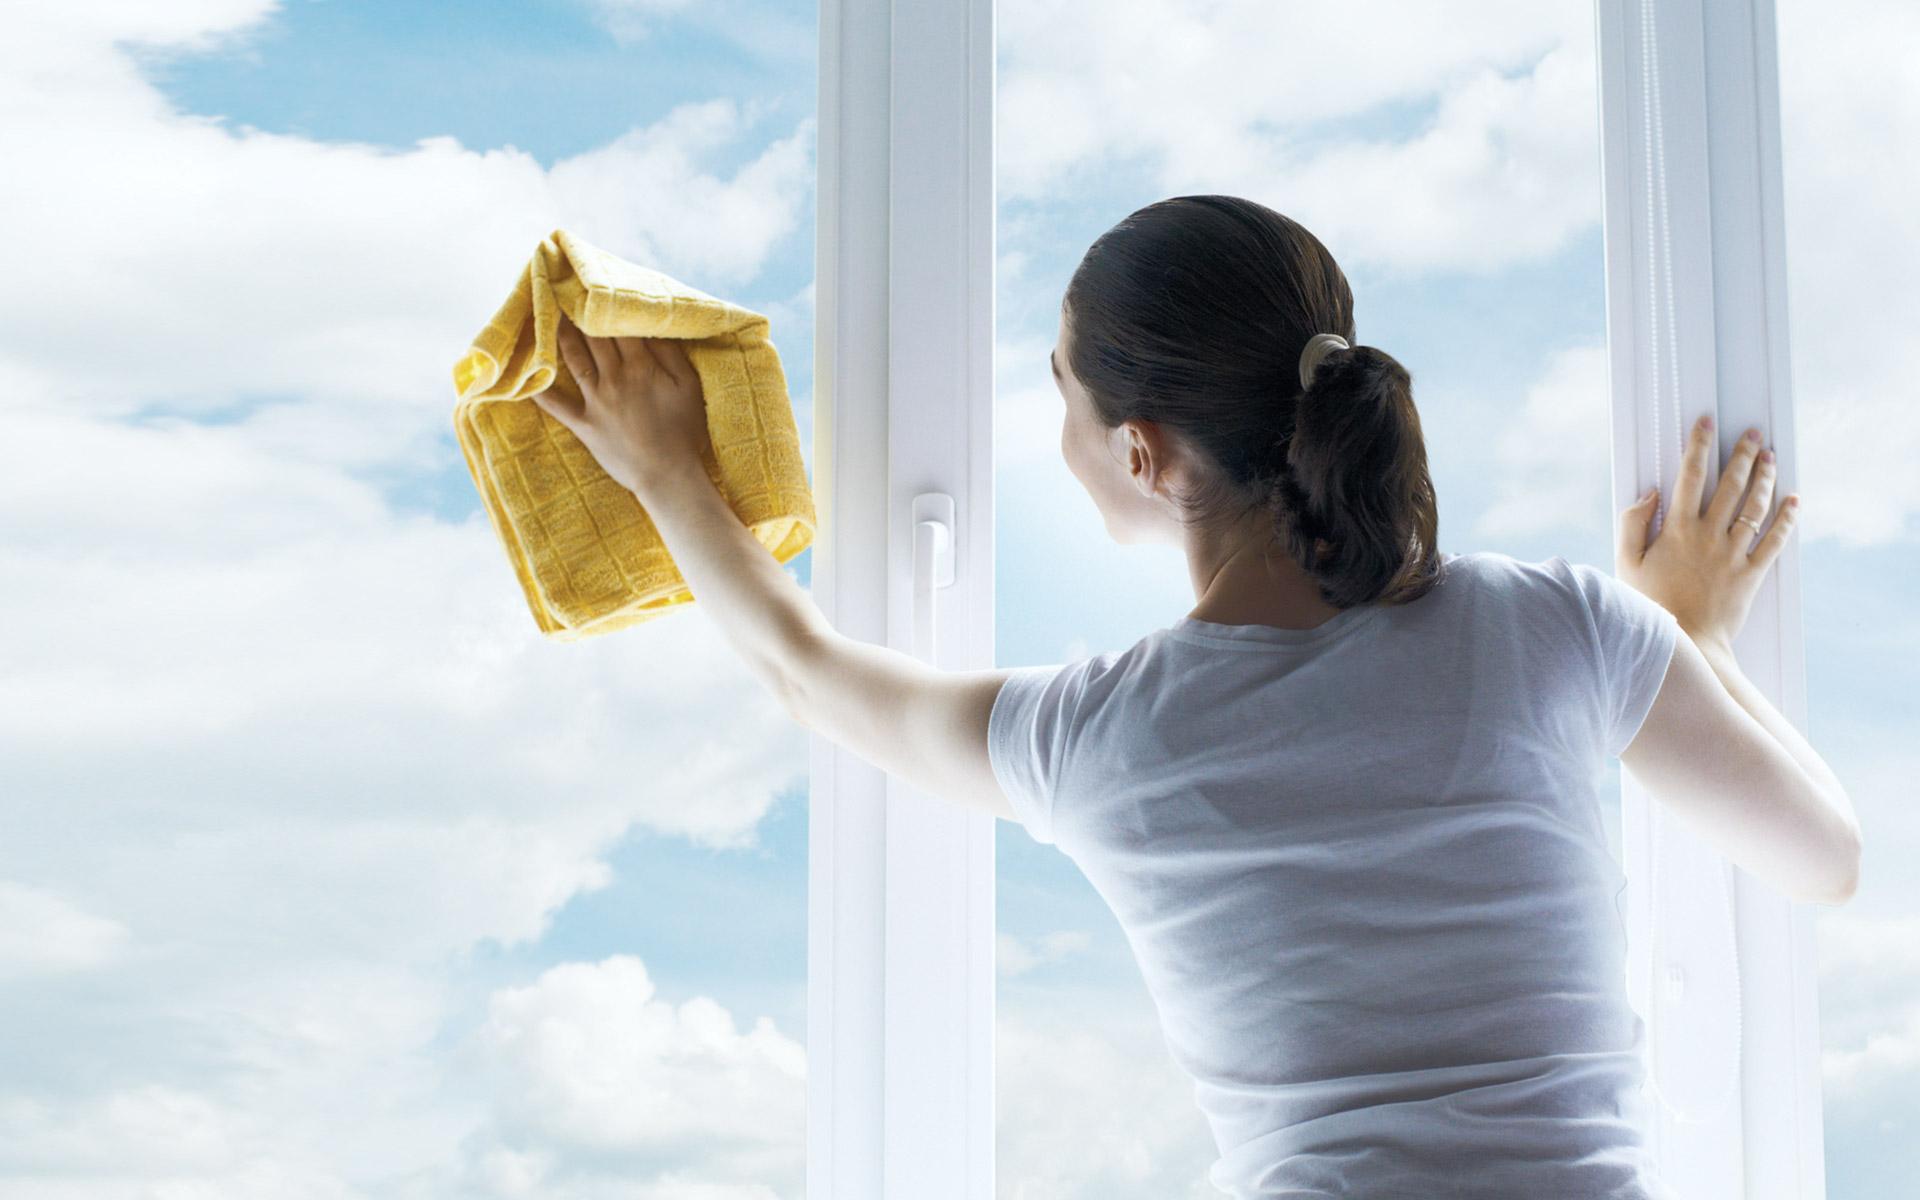 Грязные пластиковые окна нарушают эстетику фасада